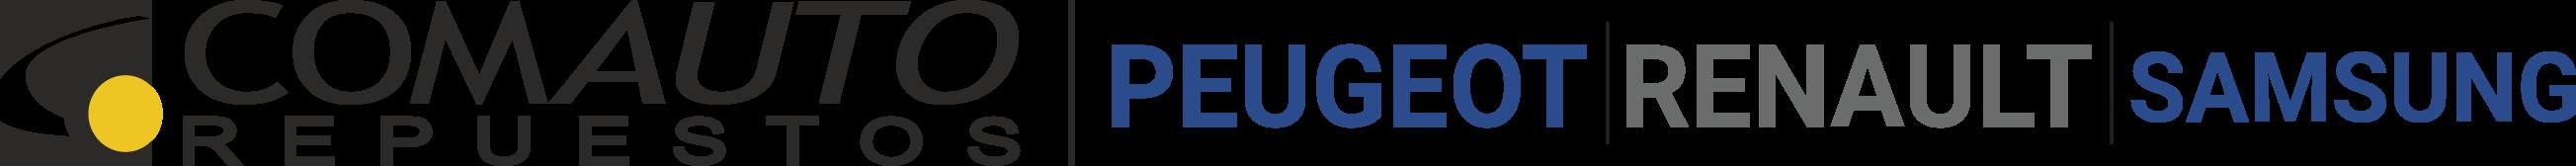 Peugeot | Renault | Samsung